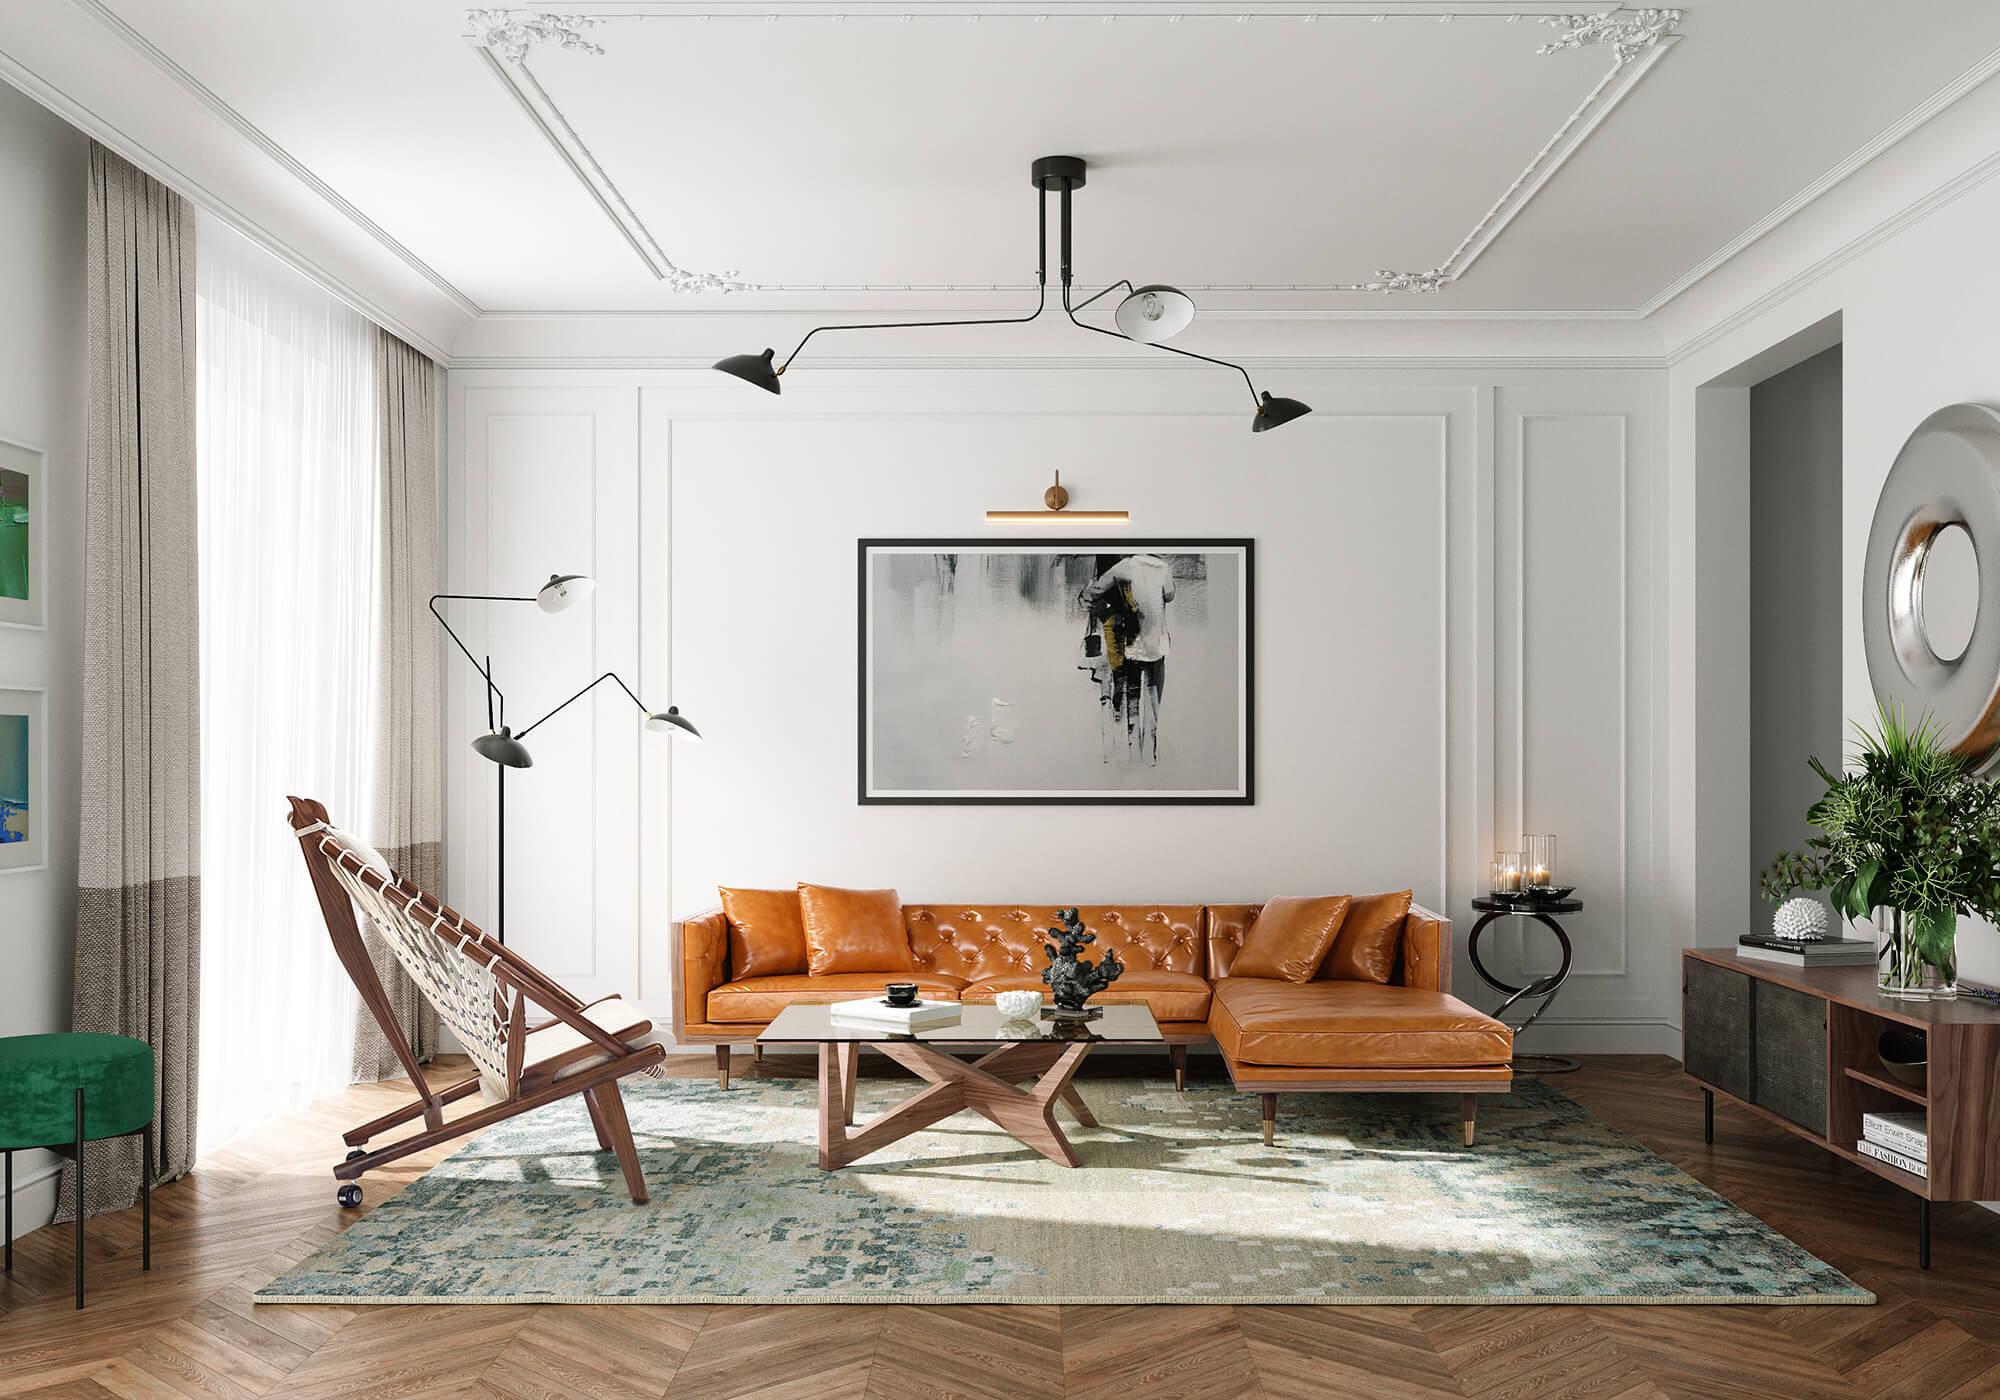 Woodneo Hoop Dream Dot Crossbow 4 Mid Century Modern Sofa